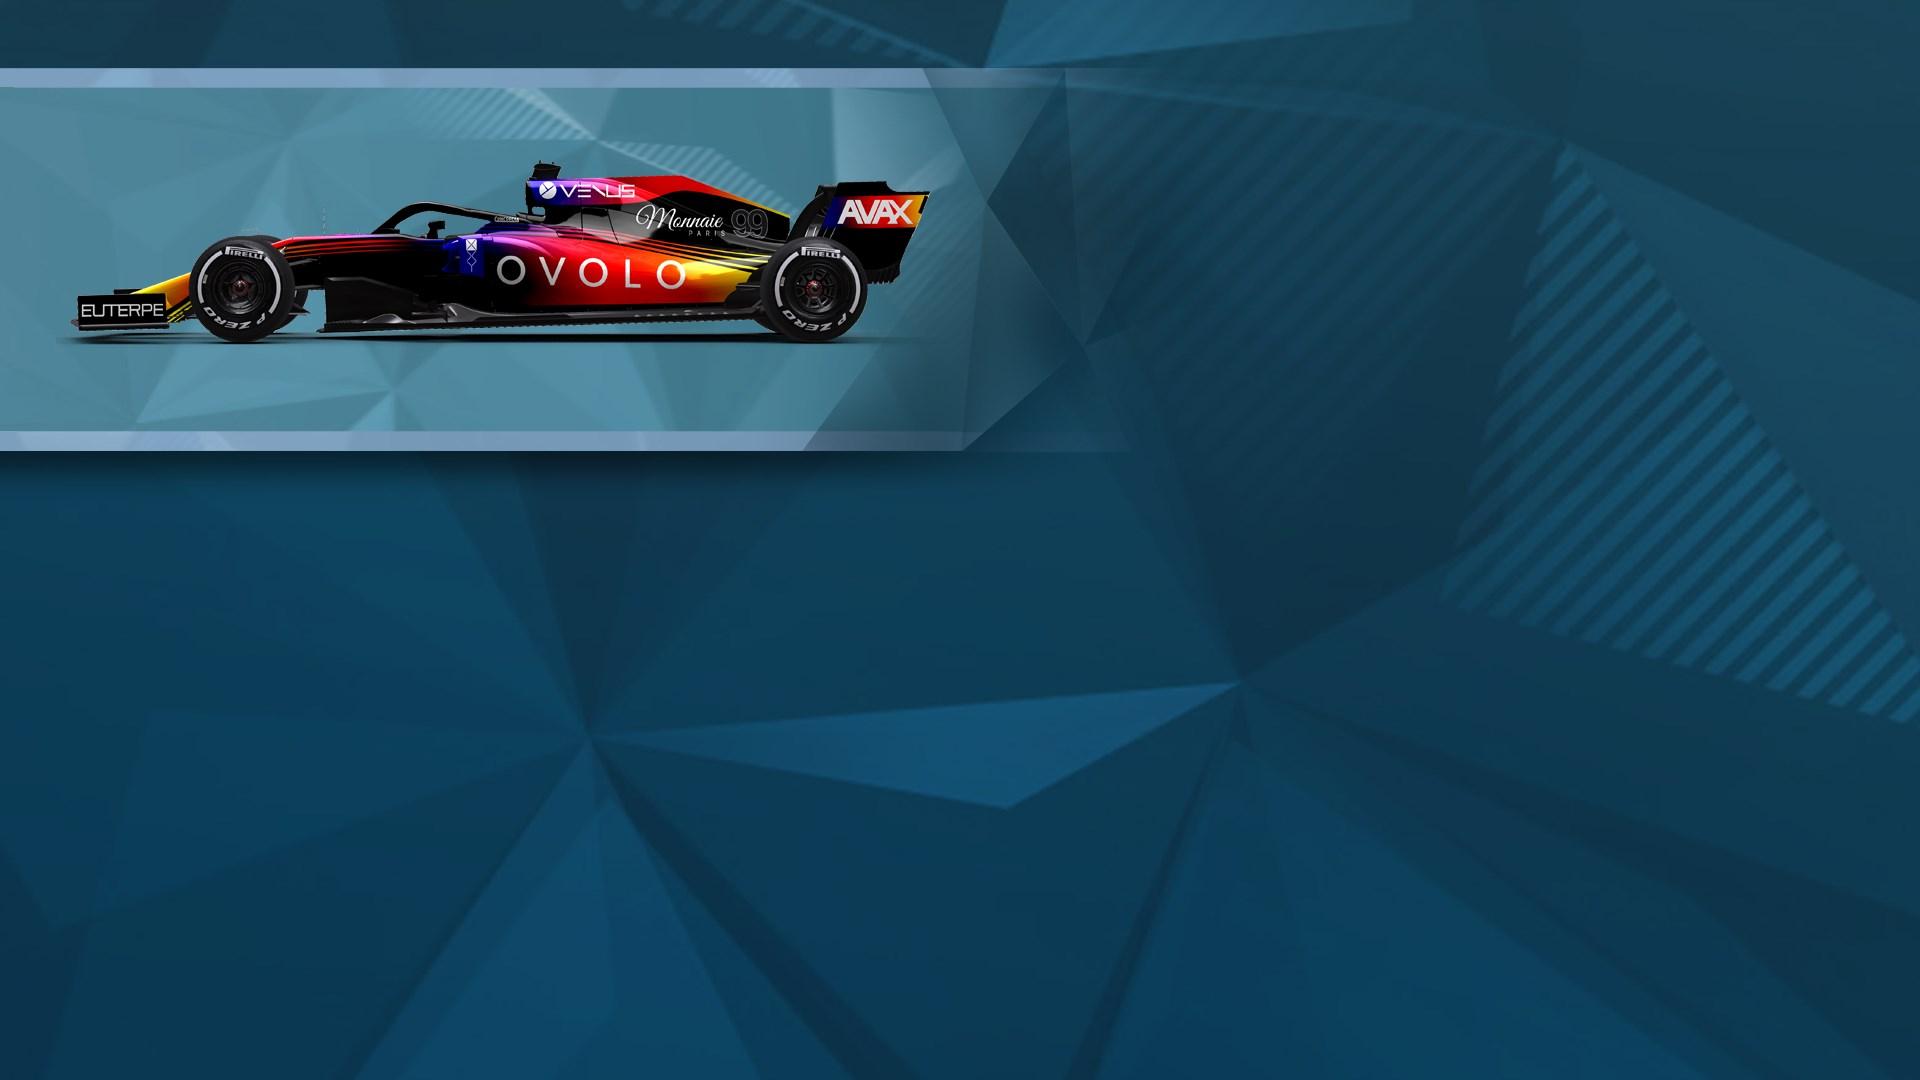 F1® 2019 WS: Car Livery 'OVOLO - Blur'